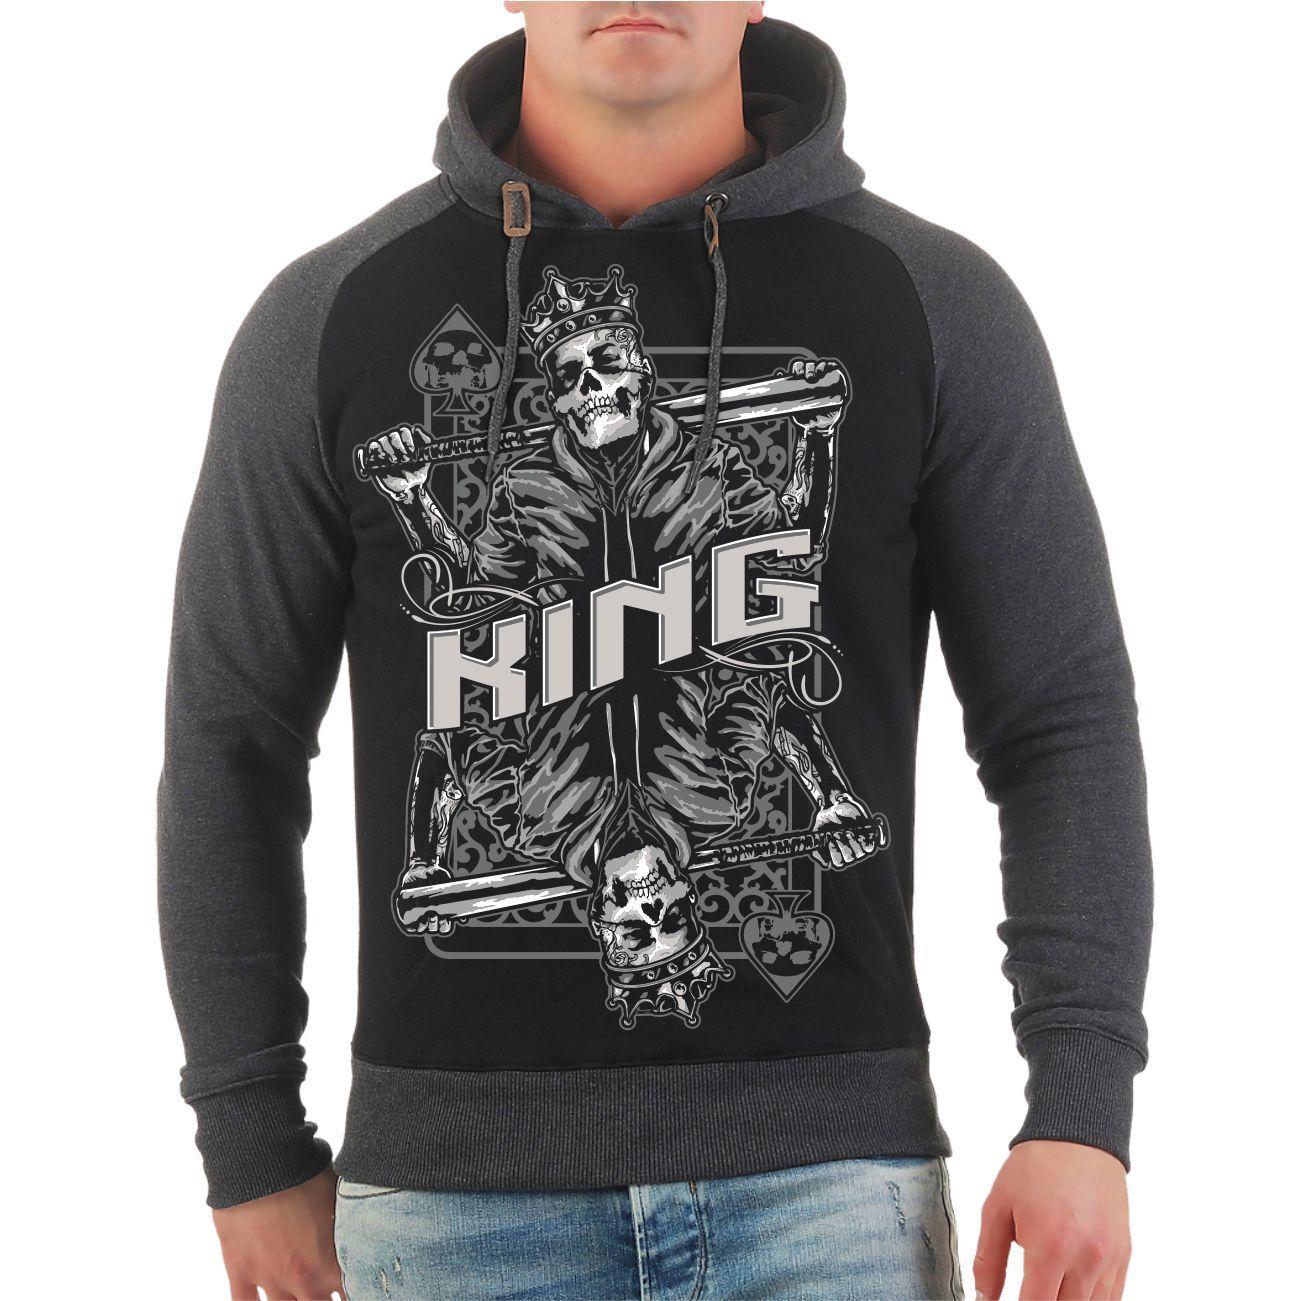 Kapuzenpullover King Outfit Weihnachten Geschenk Pärchen Partner Look Hoodie